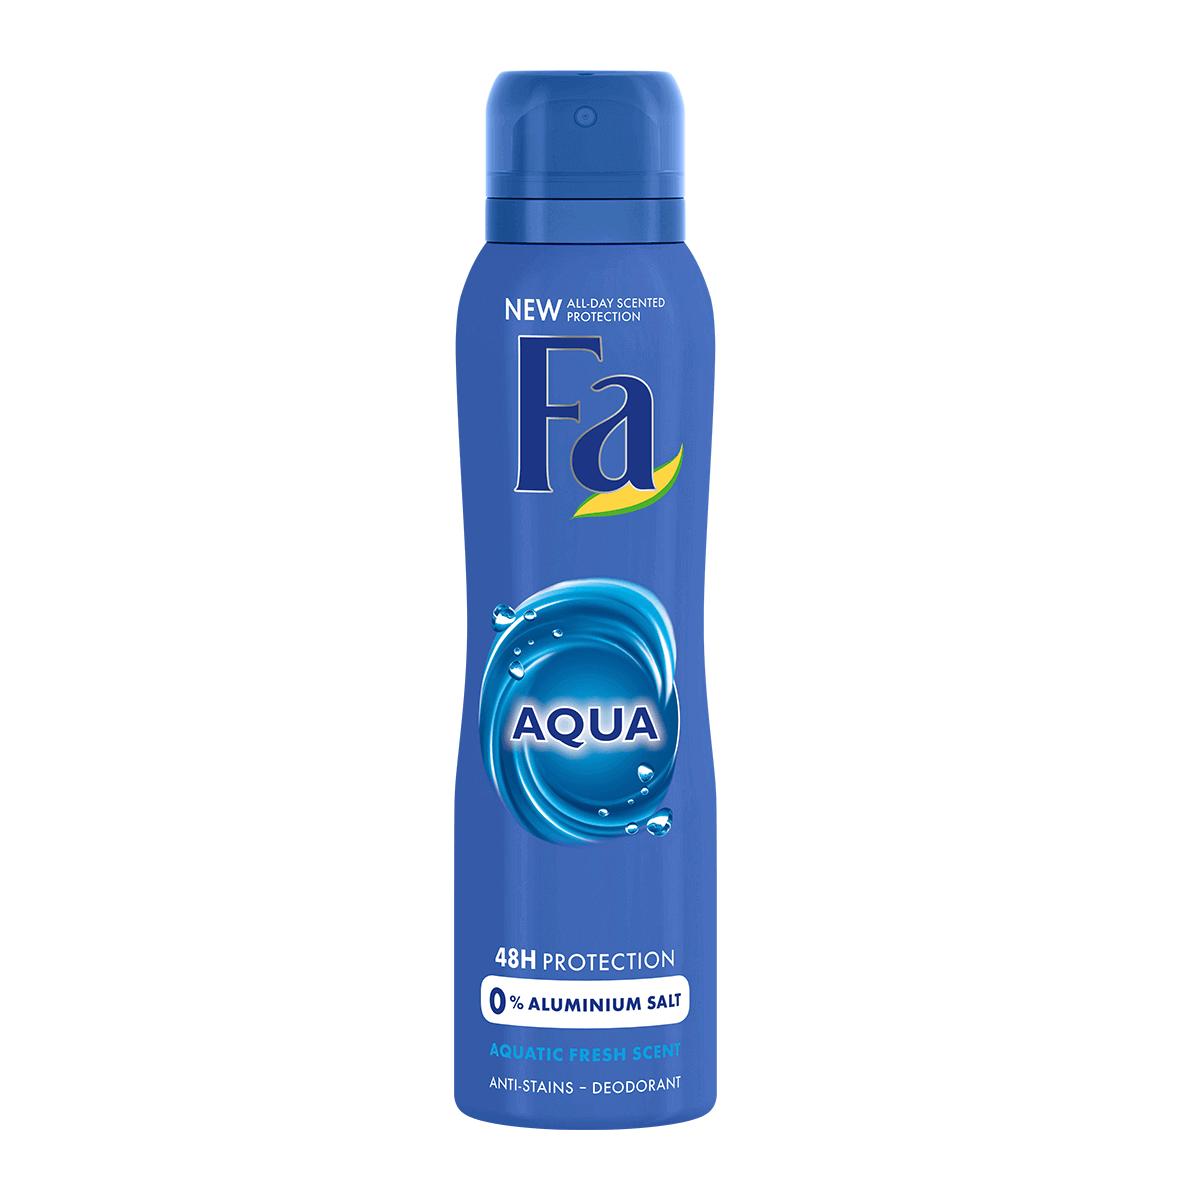 Aqua Kadın Deodorant 150 ml